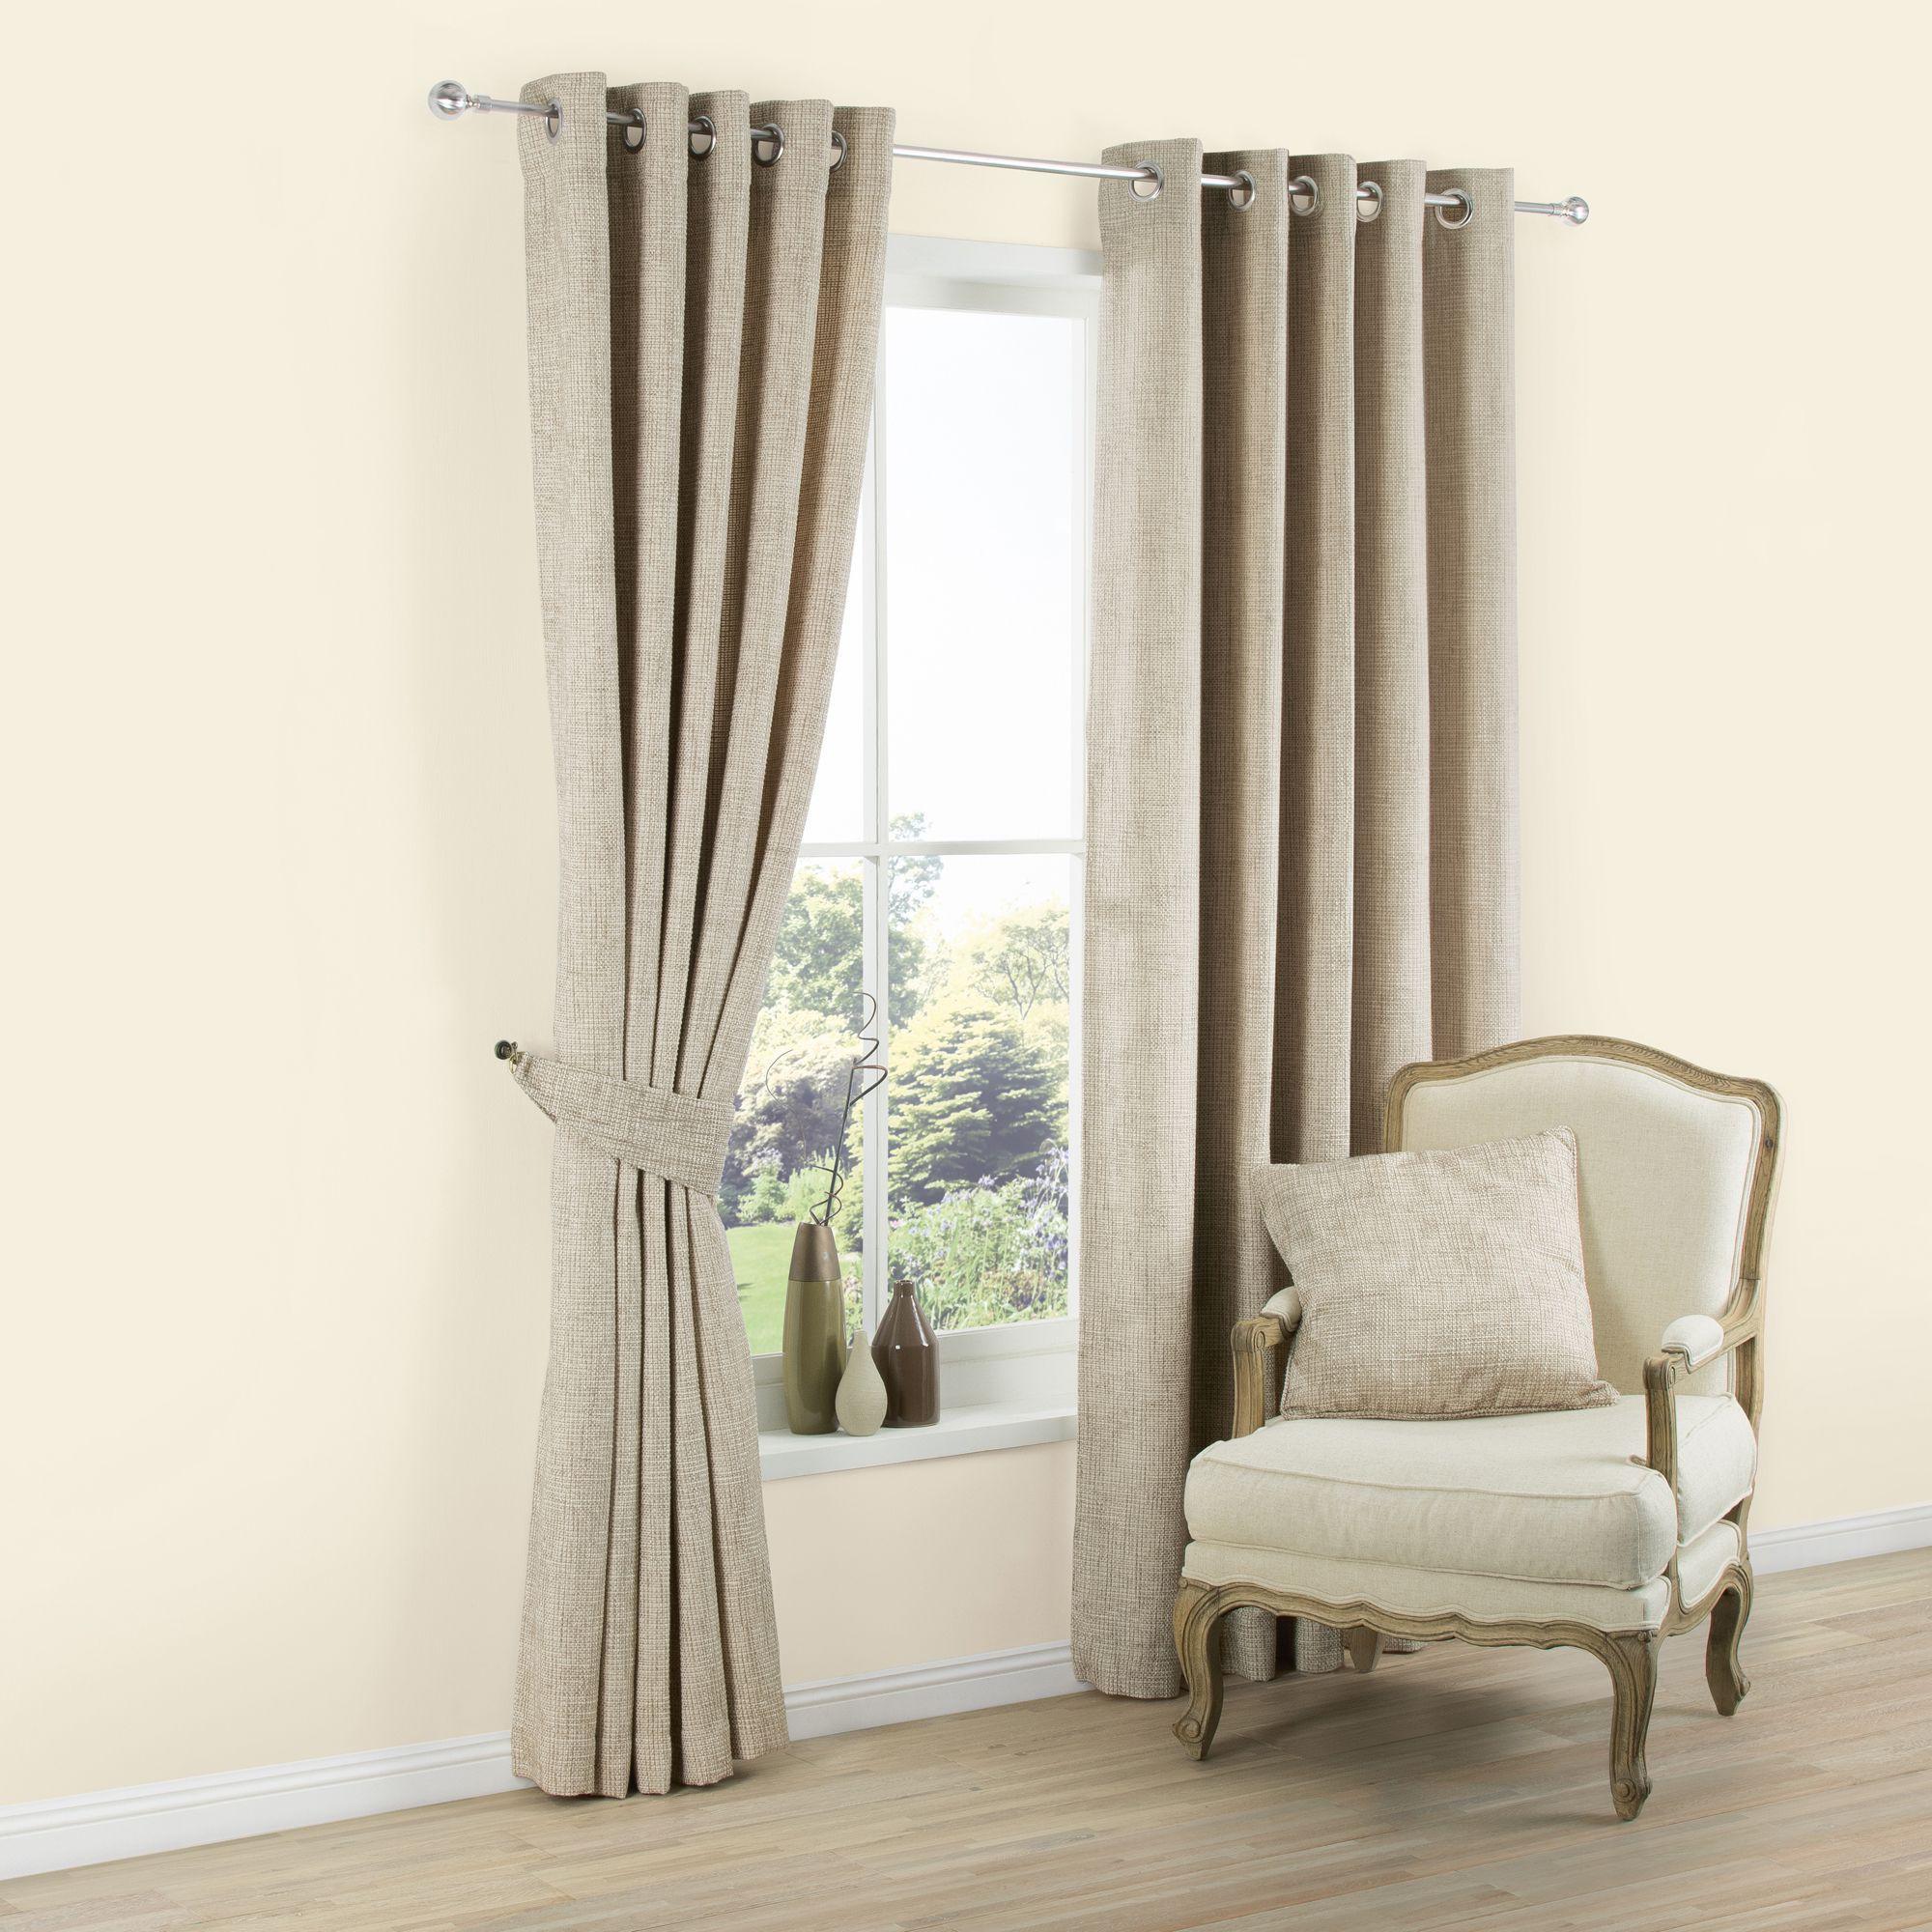 Carina Ecru & Seine Plain Woven Eyelet Lined Curtains (w)228 Cm (l)228 Cm